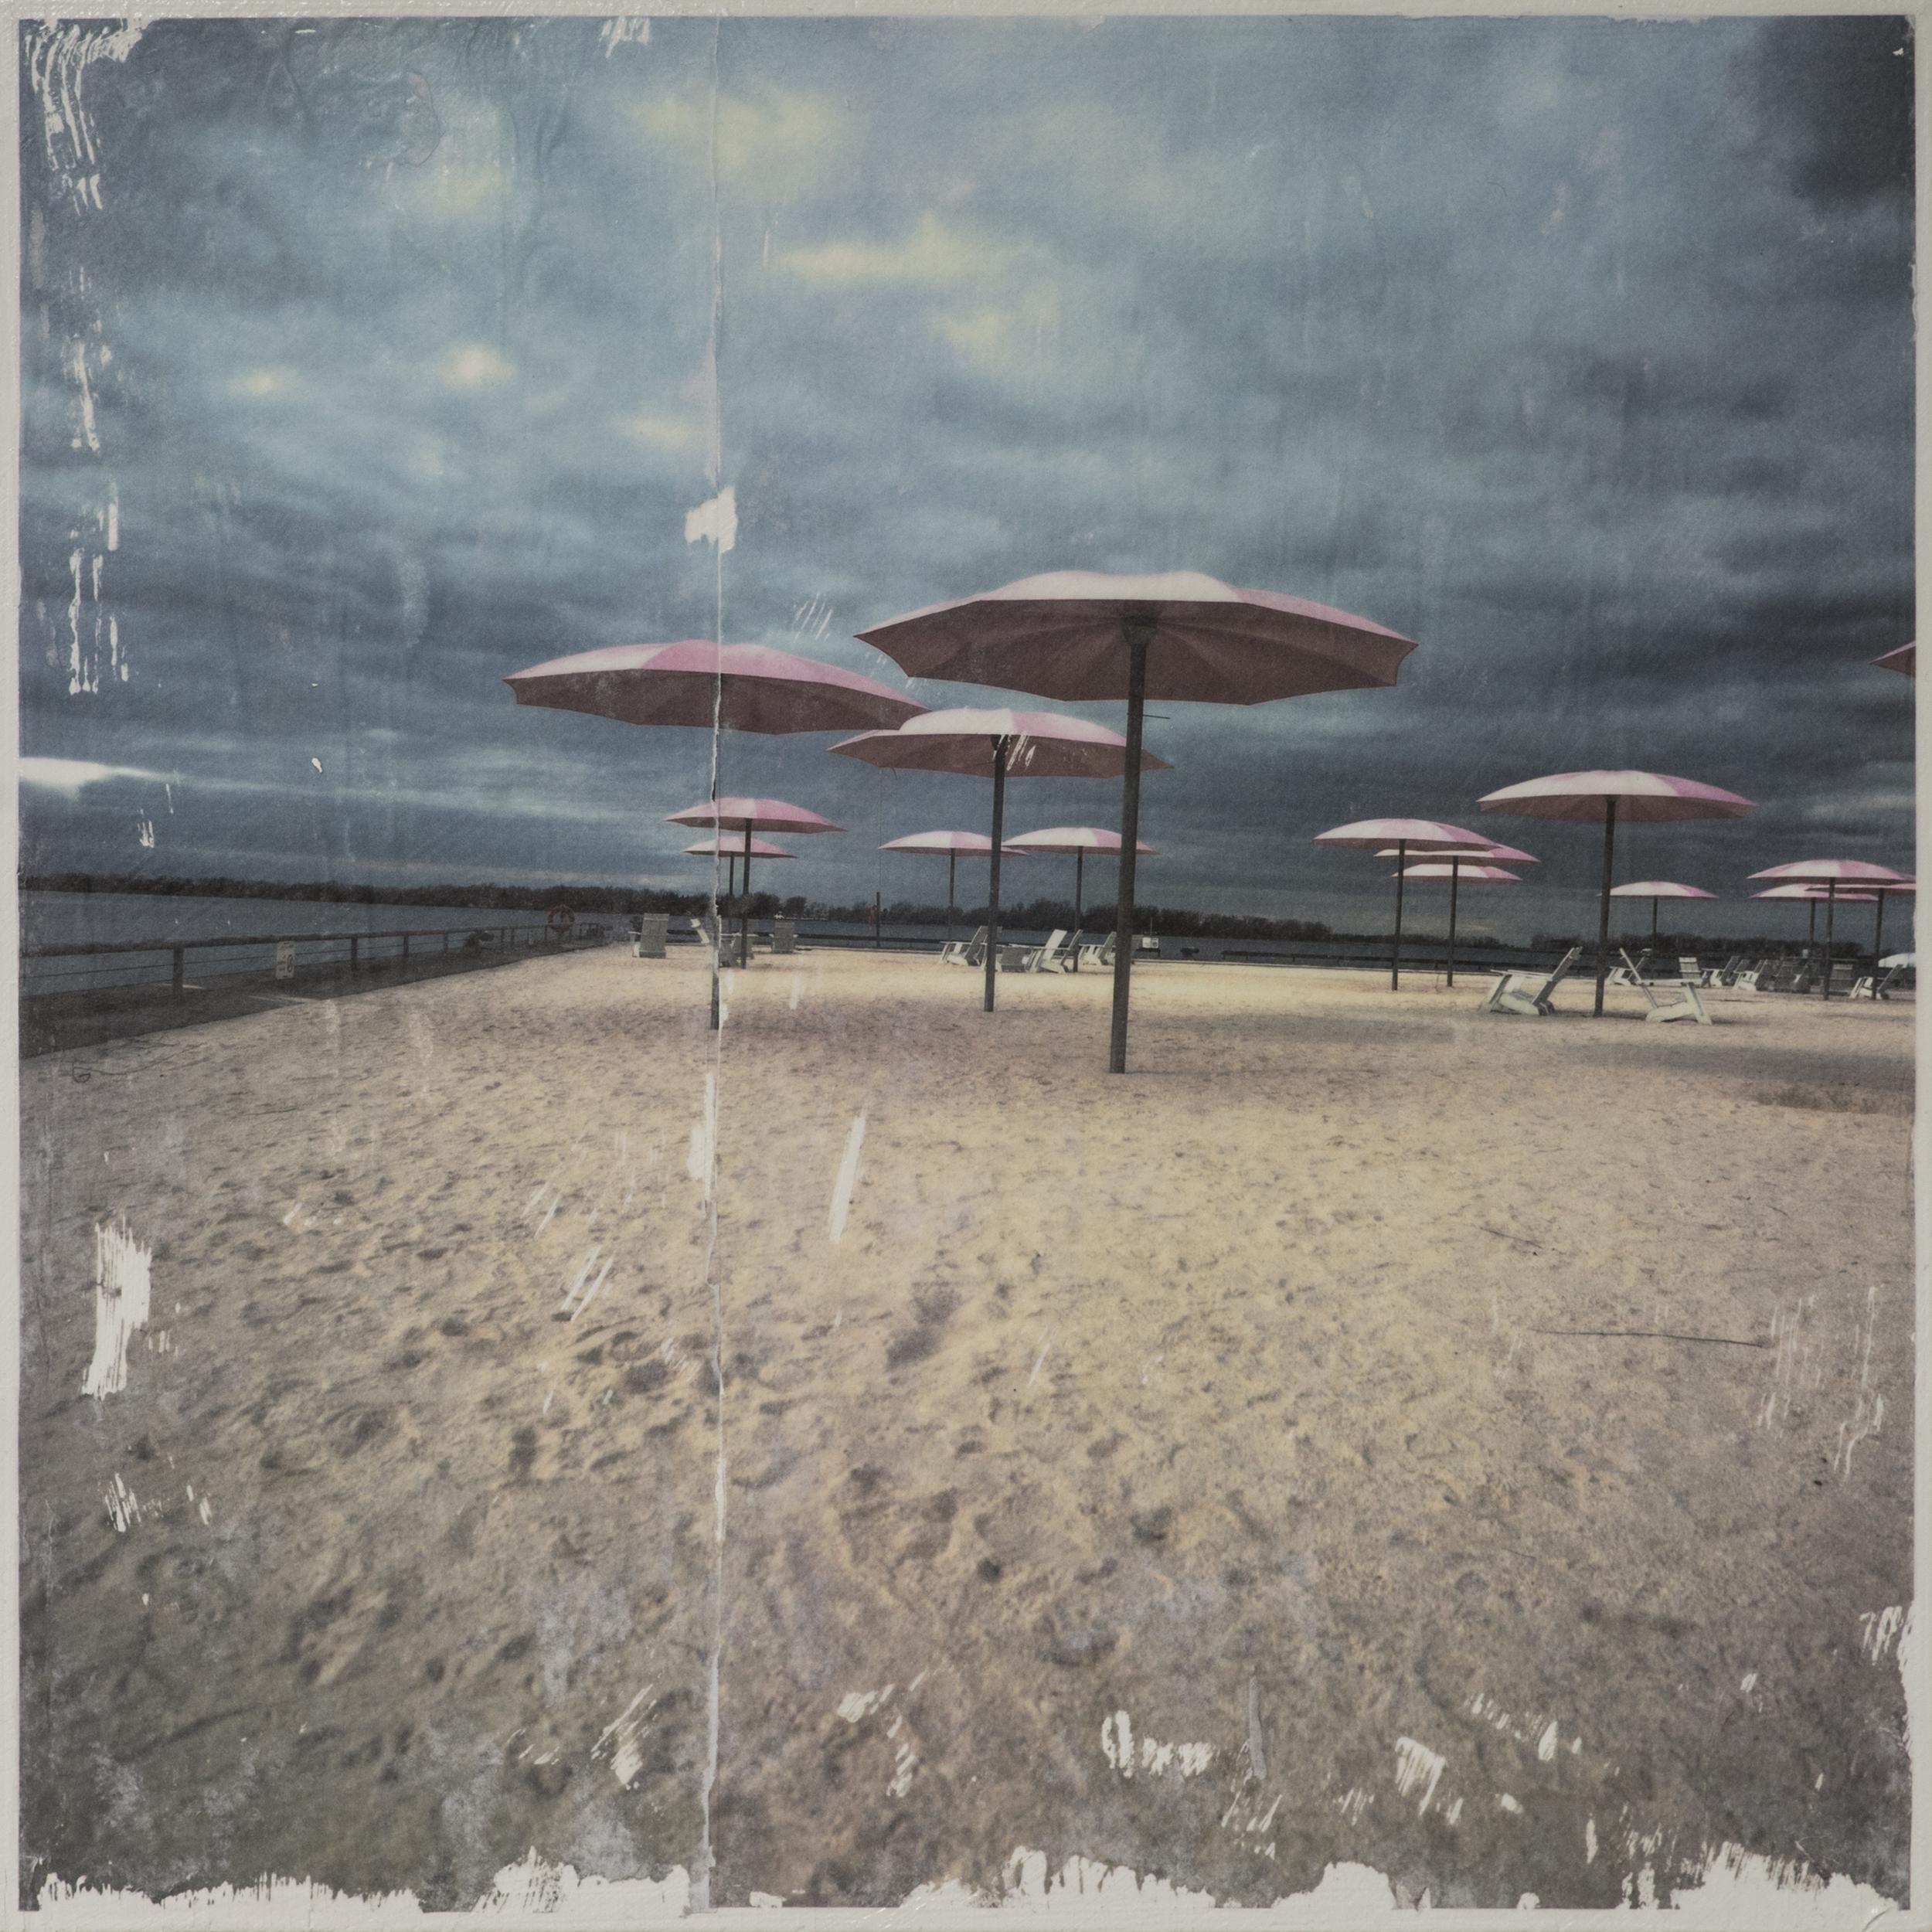 """Sugar Beach""  15x15inches - Gel medium transferred photograph"